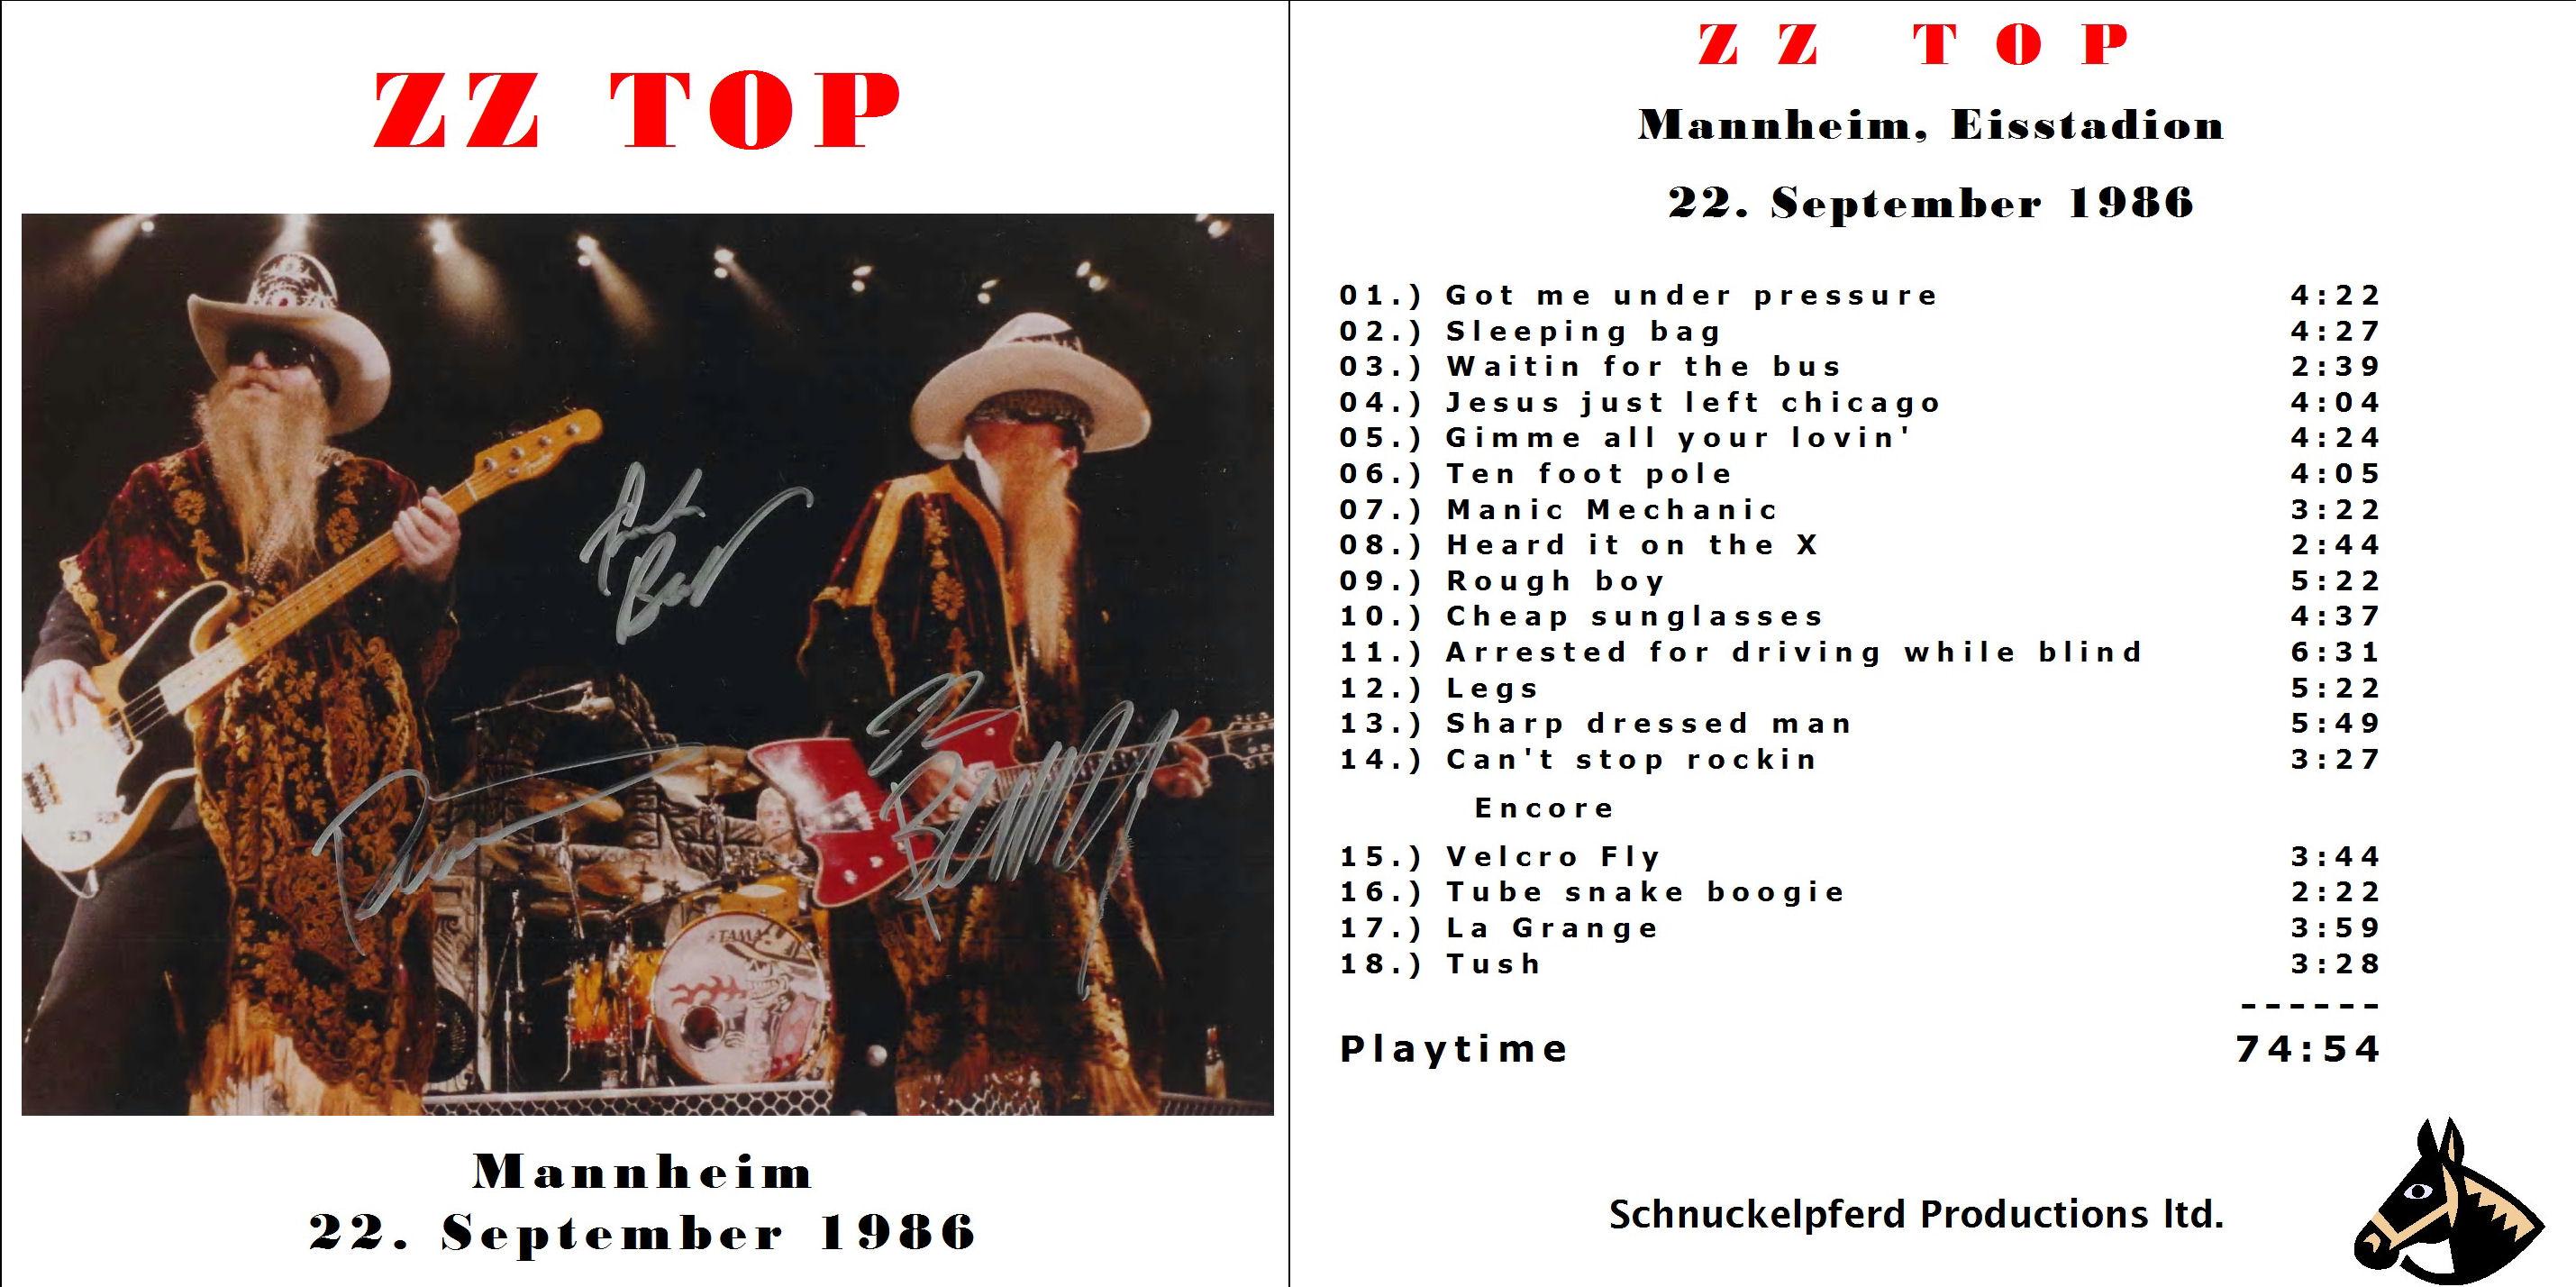 ZZTop1986-09-22EisstadionMannheimGermany.jpg